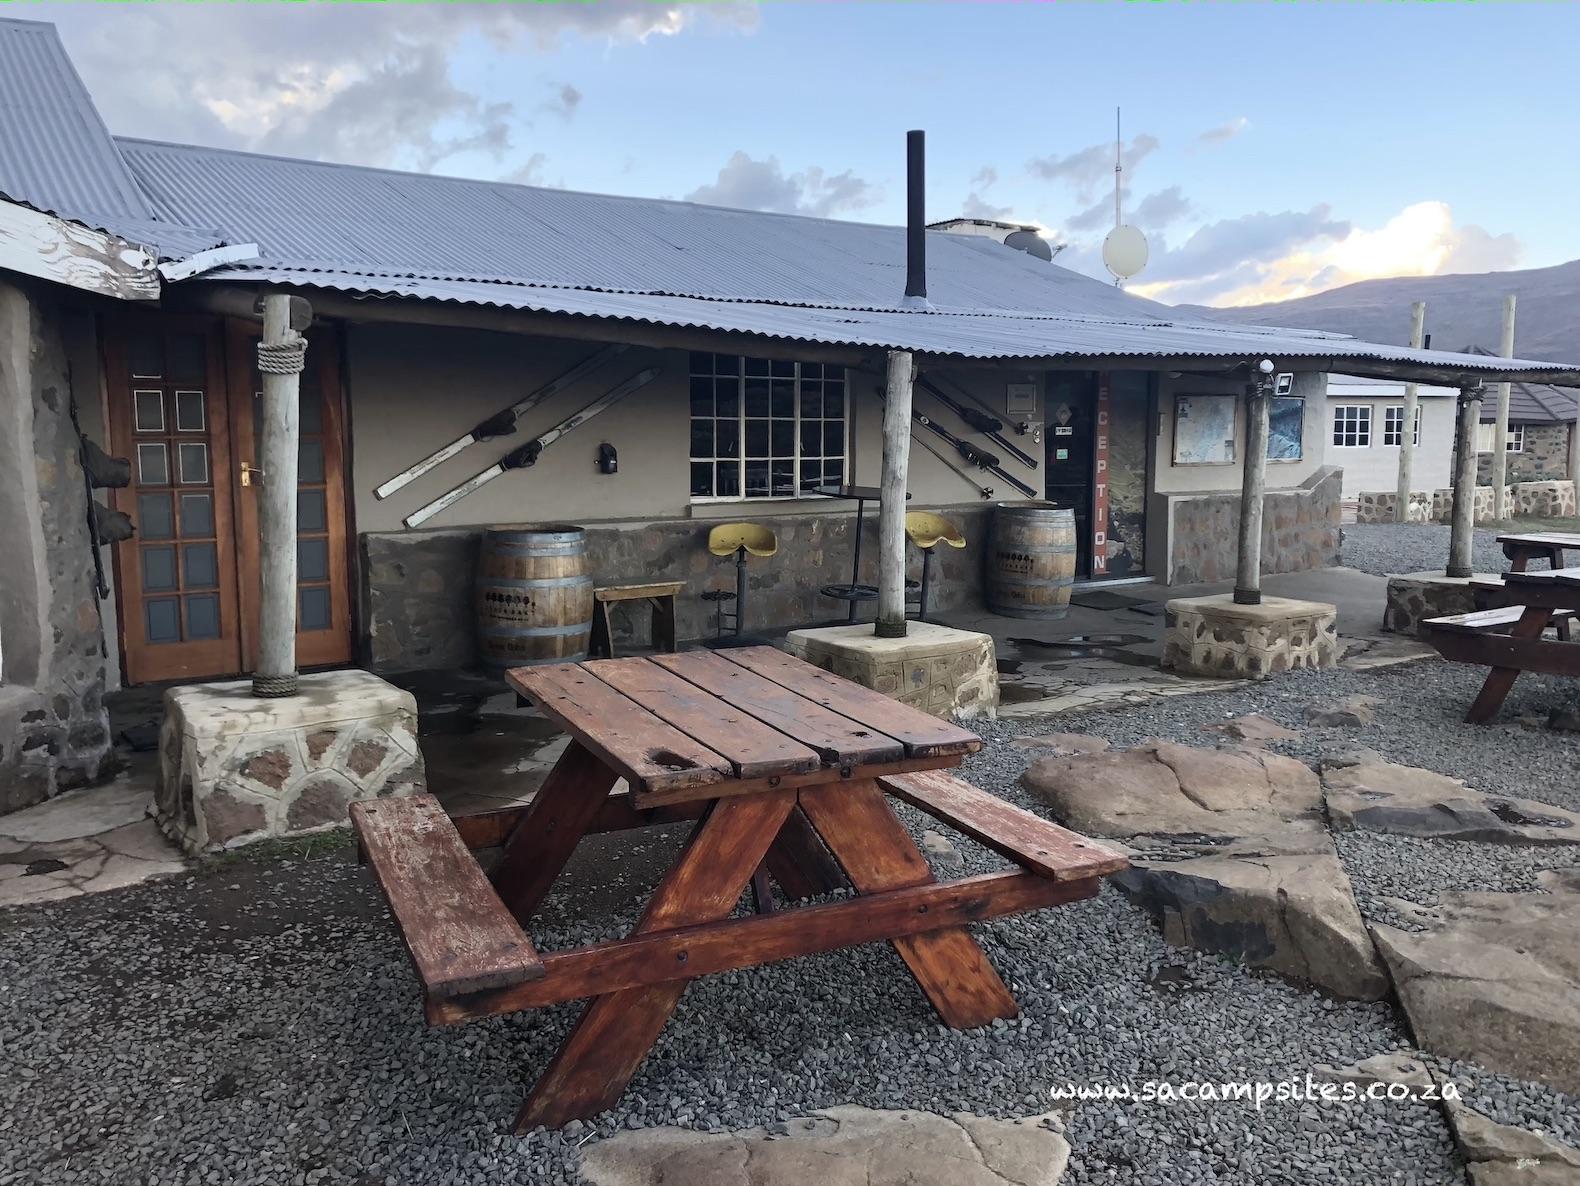 Camping at Sani Mountain Lodge